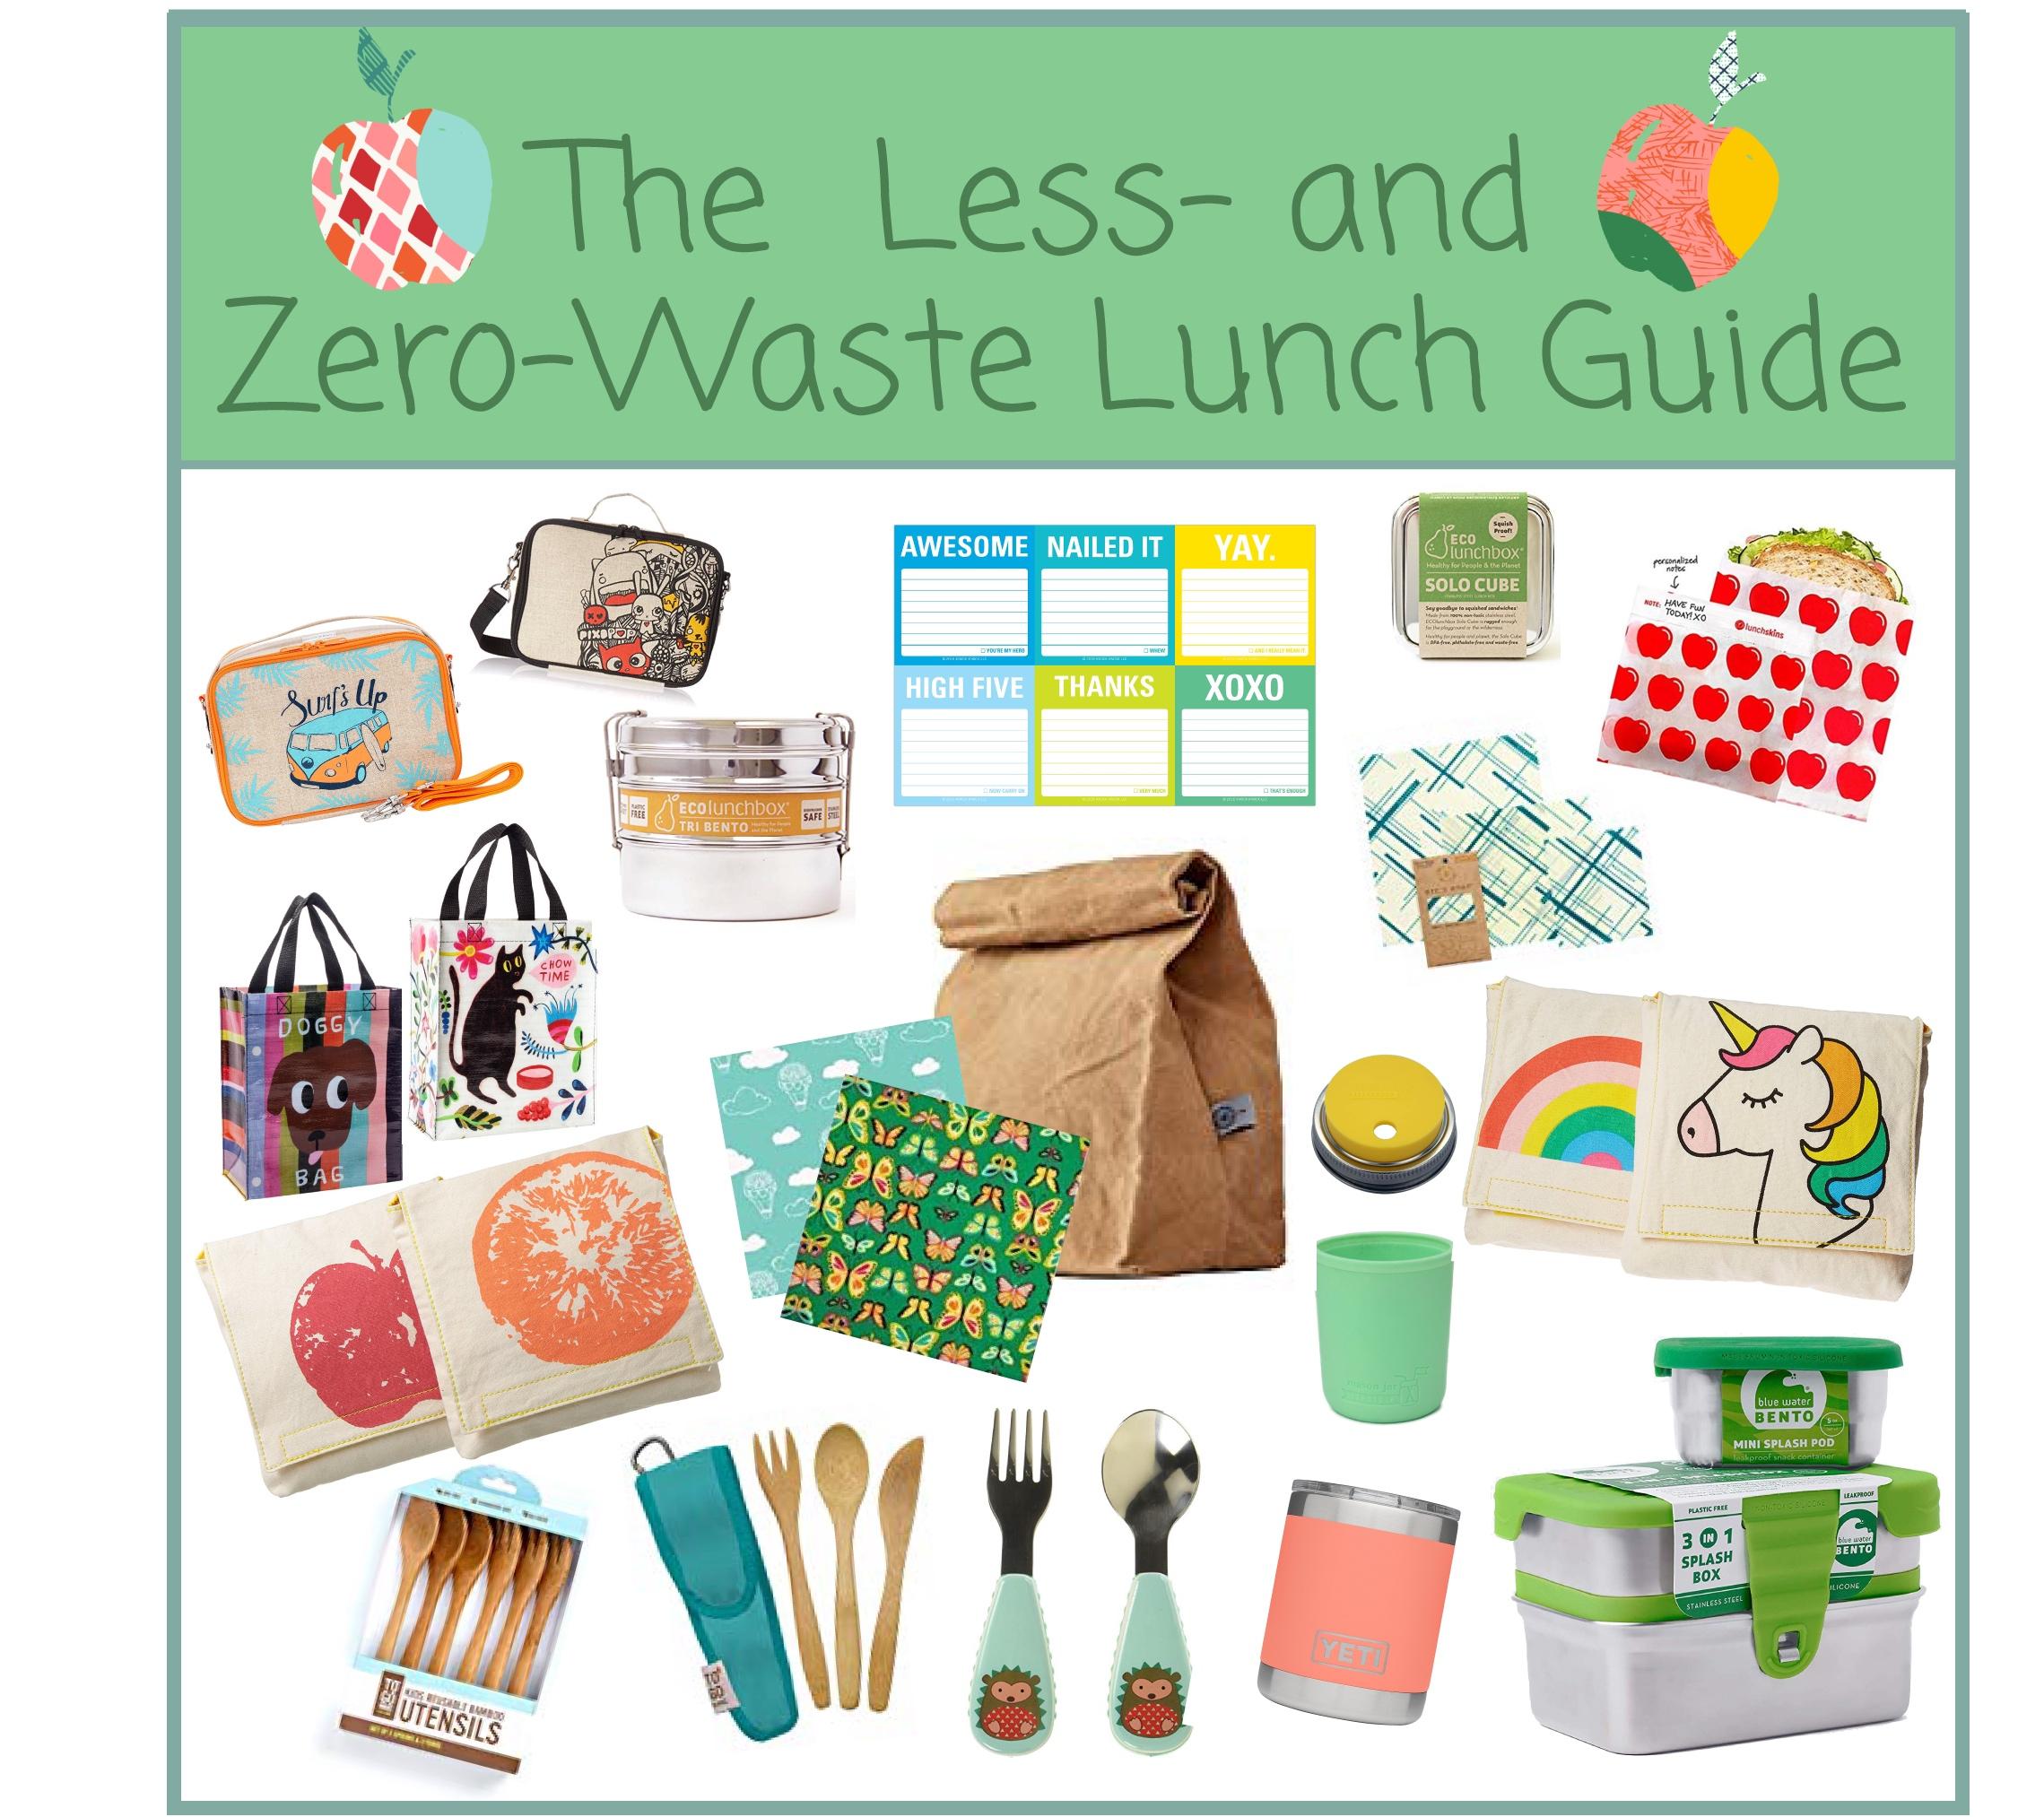 2019+Zero+Waste+Lunch+Guide%402x.jpg